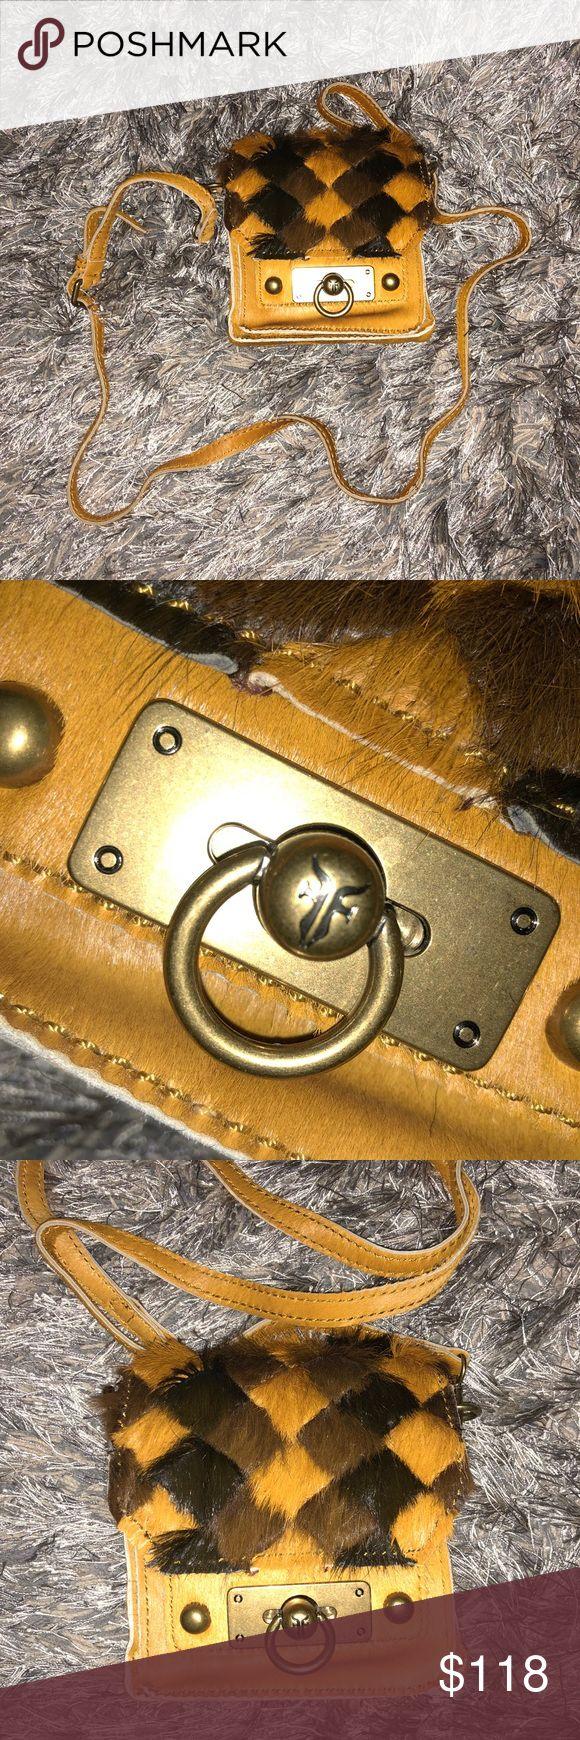 FRYE MINI FUR MUSTARD CROSSBODY BAG Brand new without tags FRYE fur mini crossbody bag. In a fun mustard color with brown and tan pattern. Gold hardware. Frye Bags Crossbody Bags